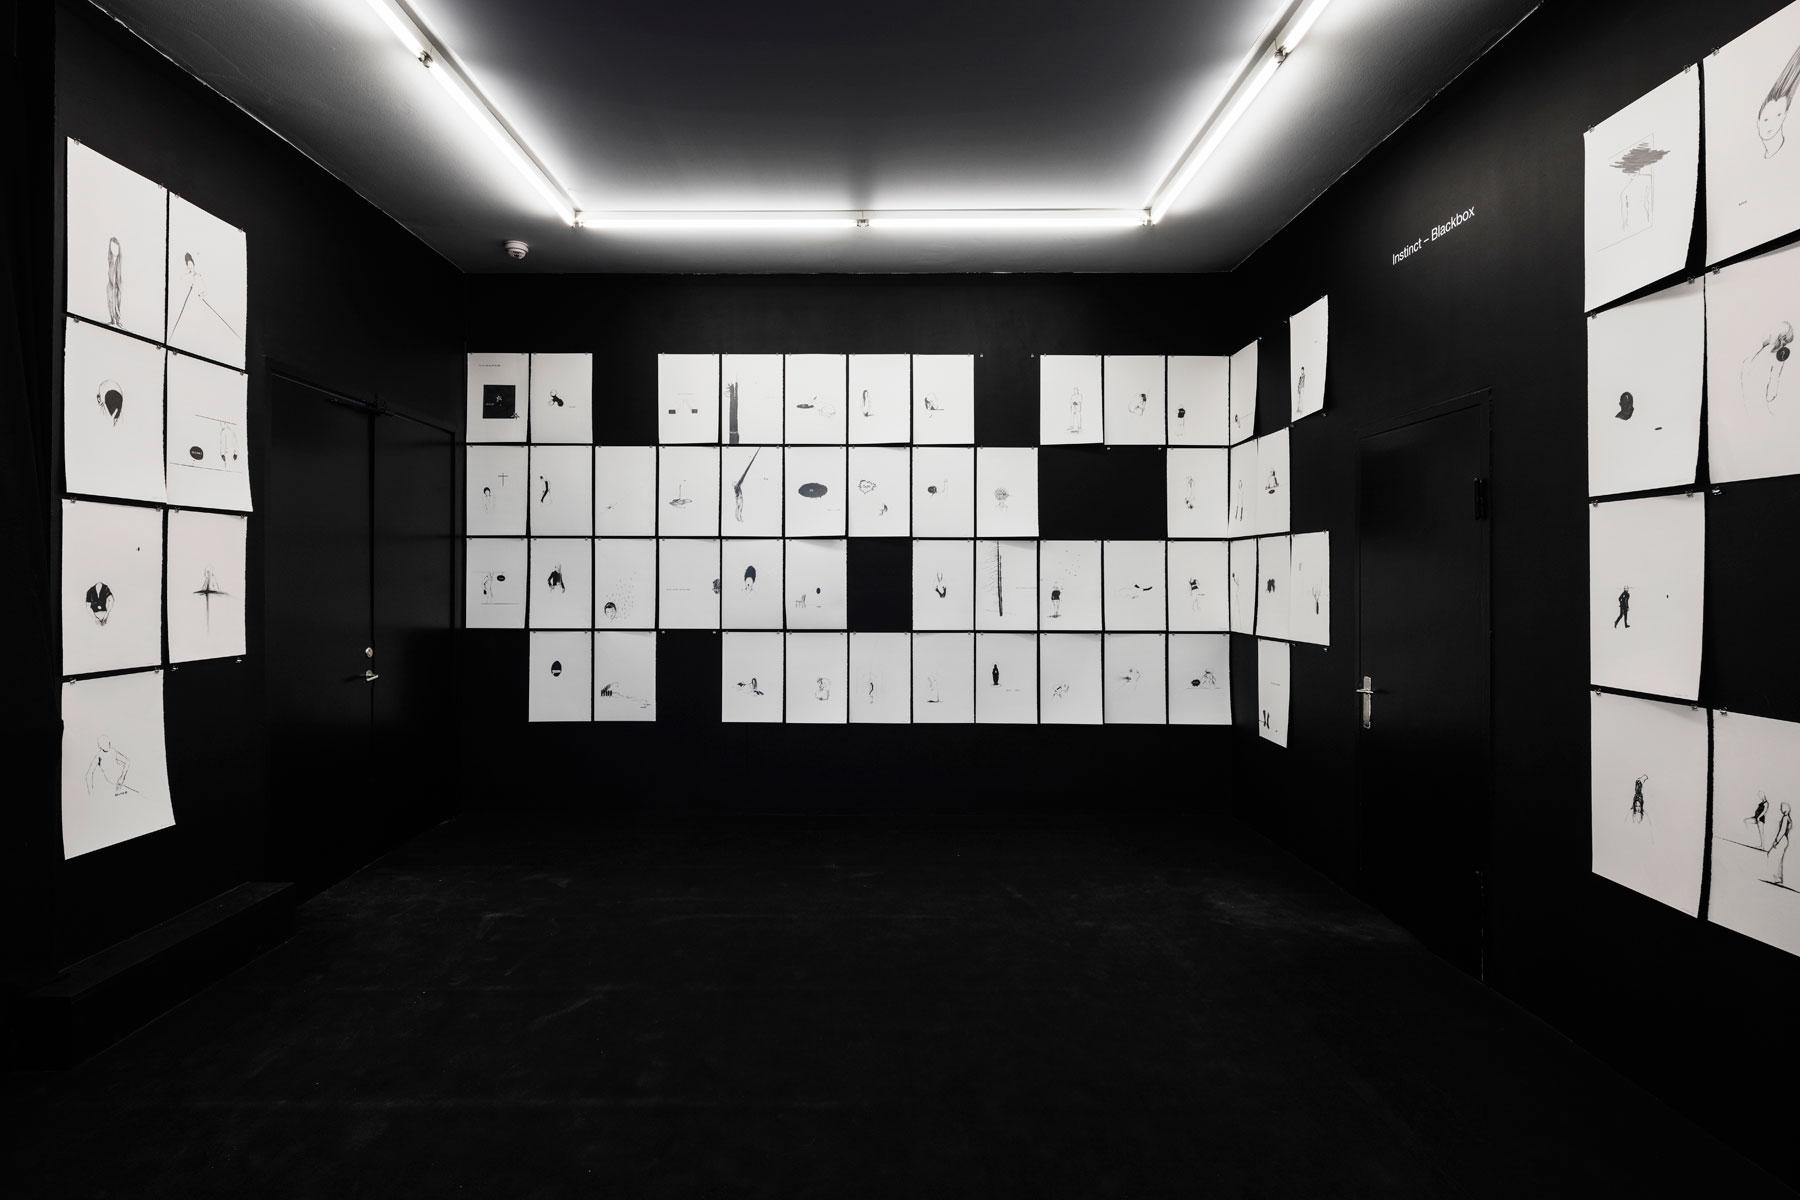 projekte-instinct-black-box-01